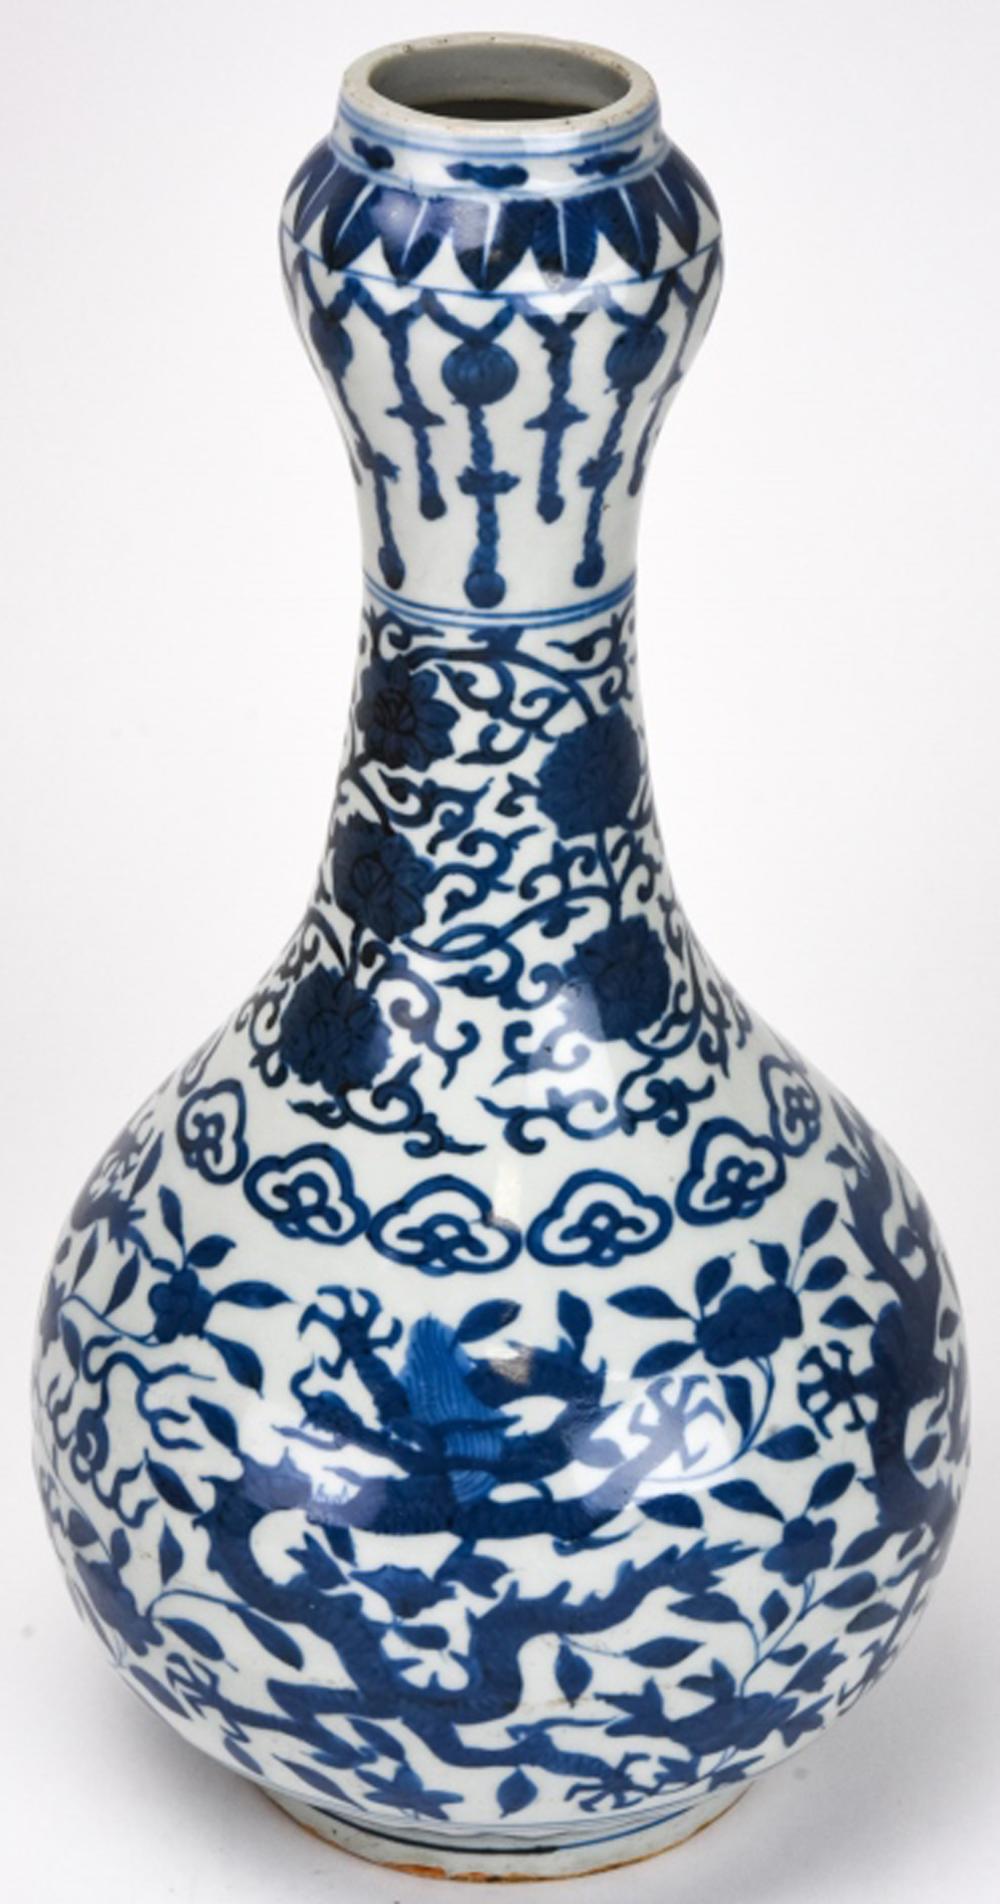 Chinese Blue & White Bottle Form Vase - Ming Mark